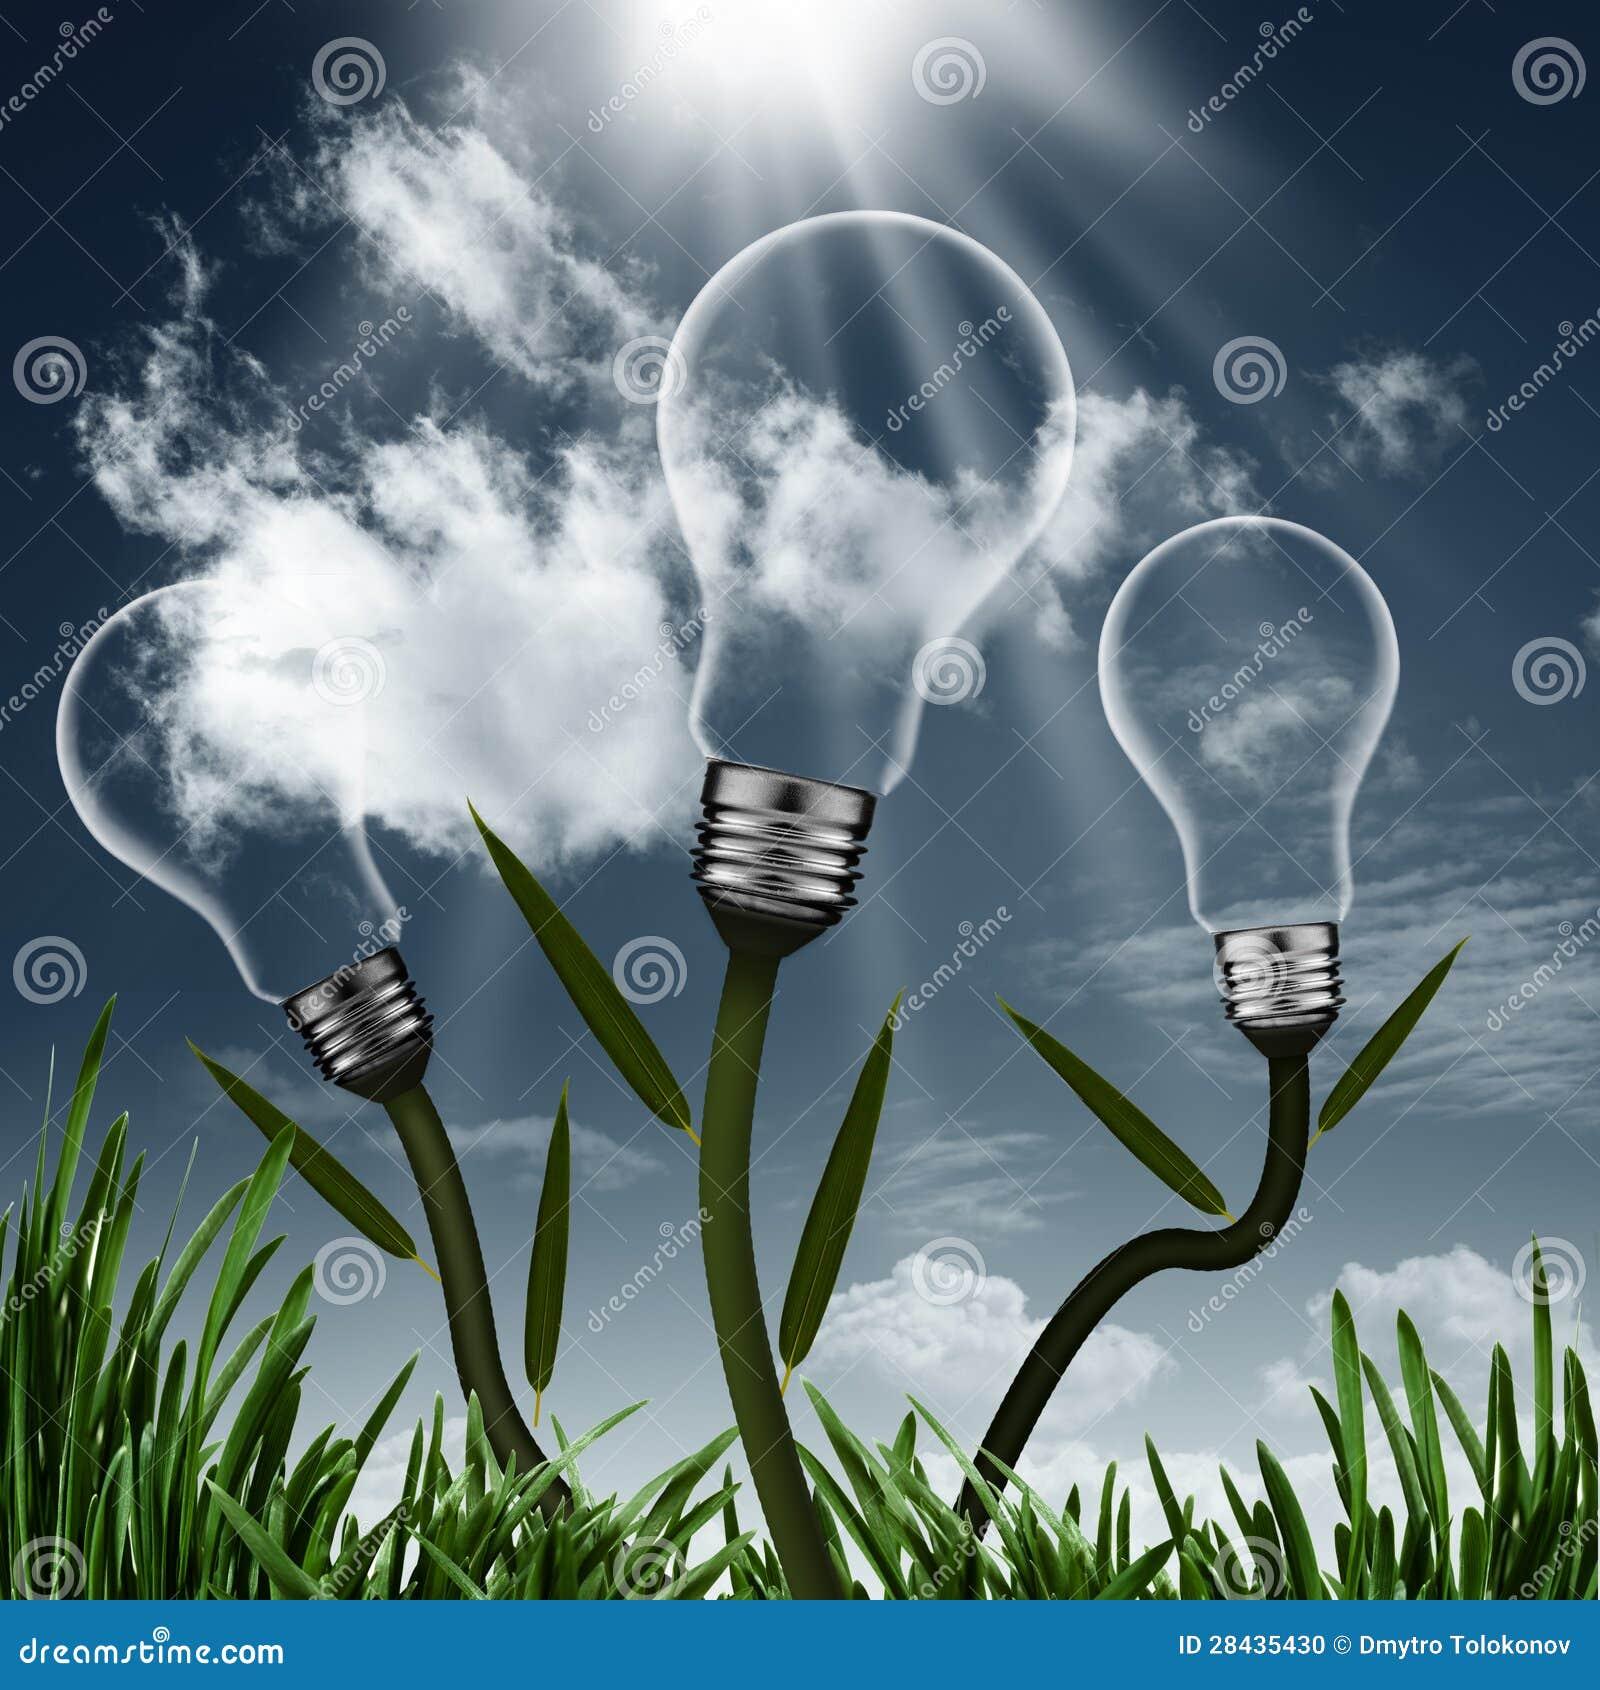 Abstract Alternative Energy Background Stock Photo